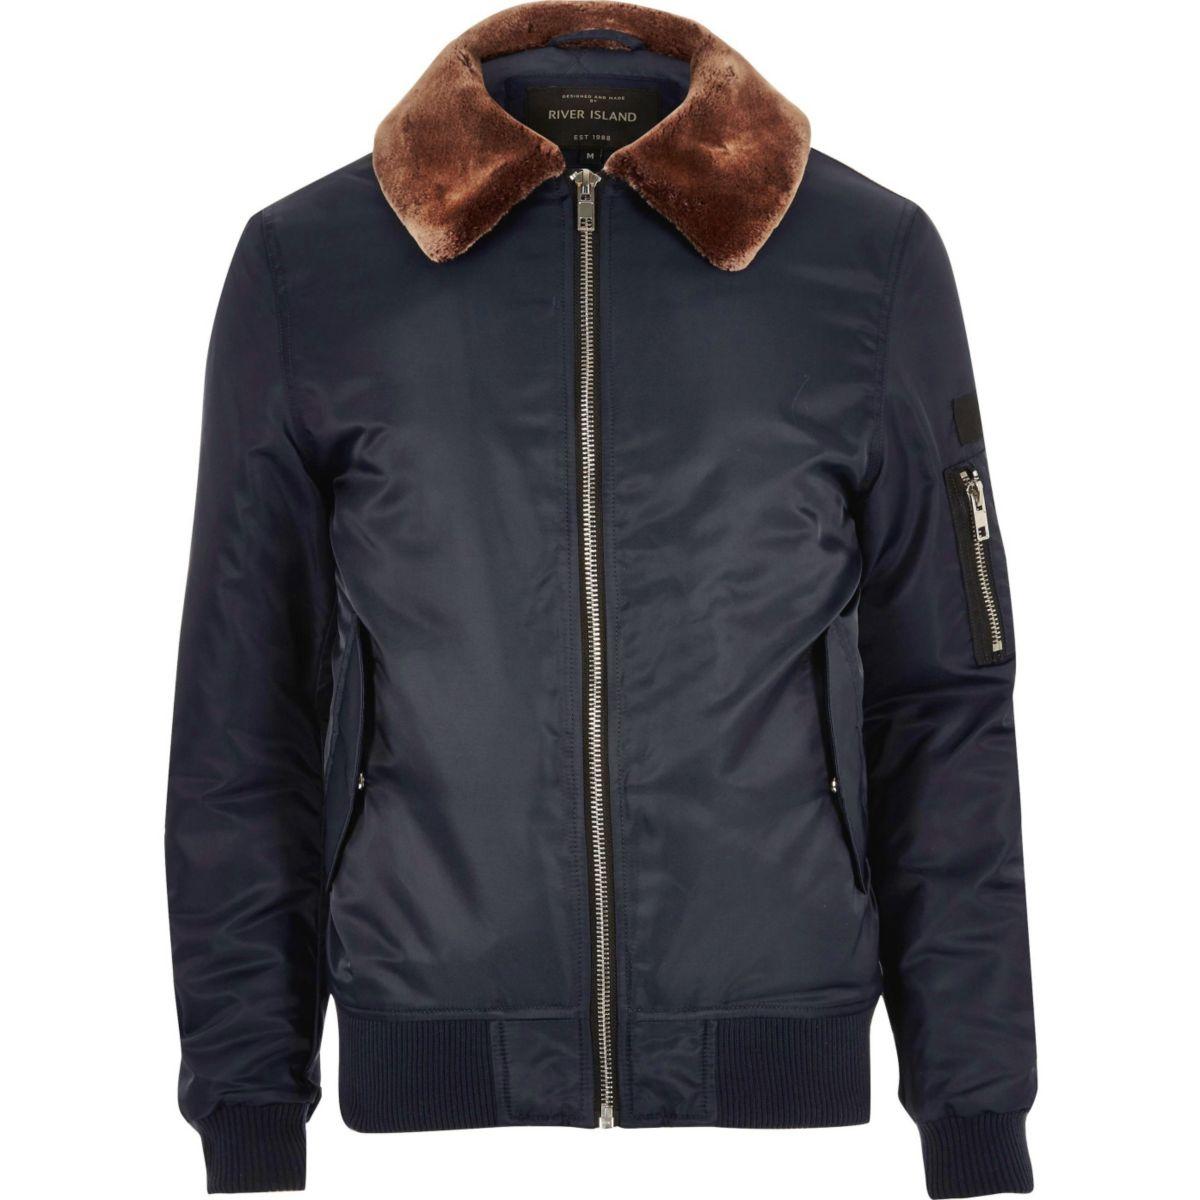 Navy blue fleece lined aviator jacket